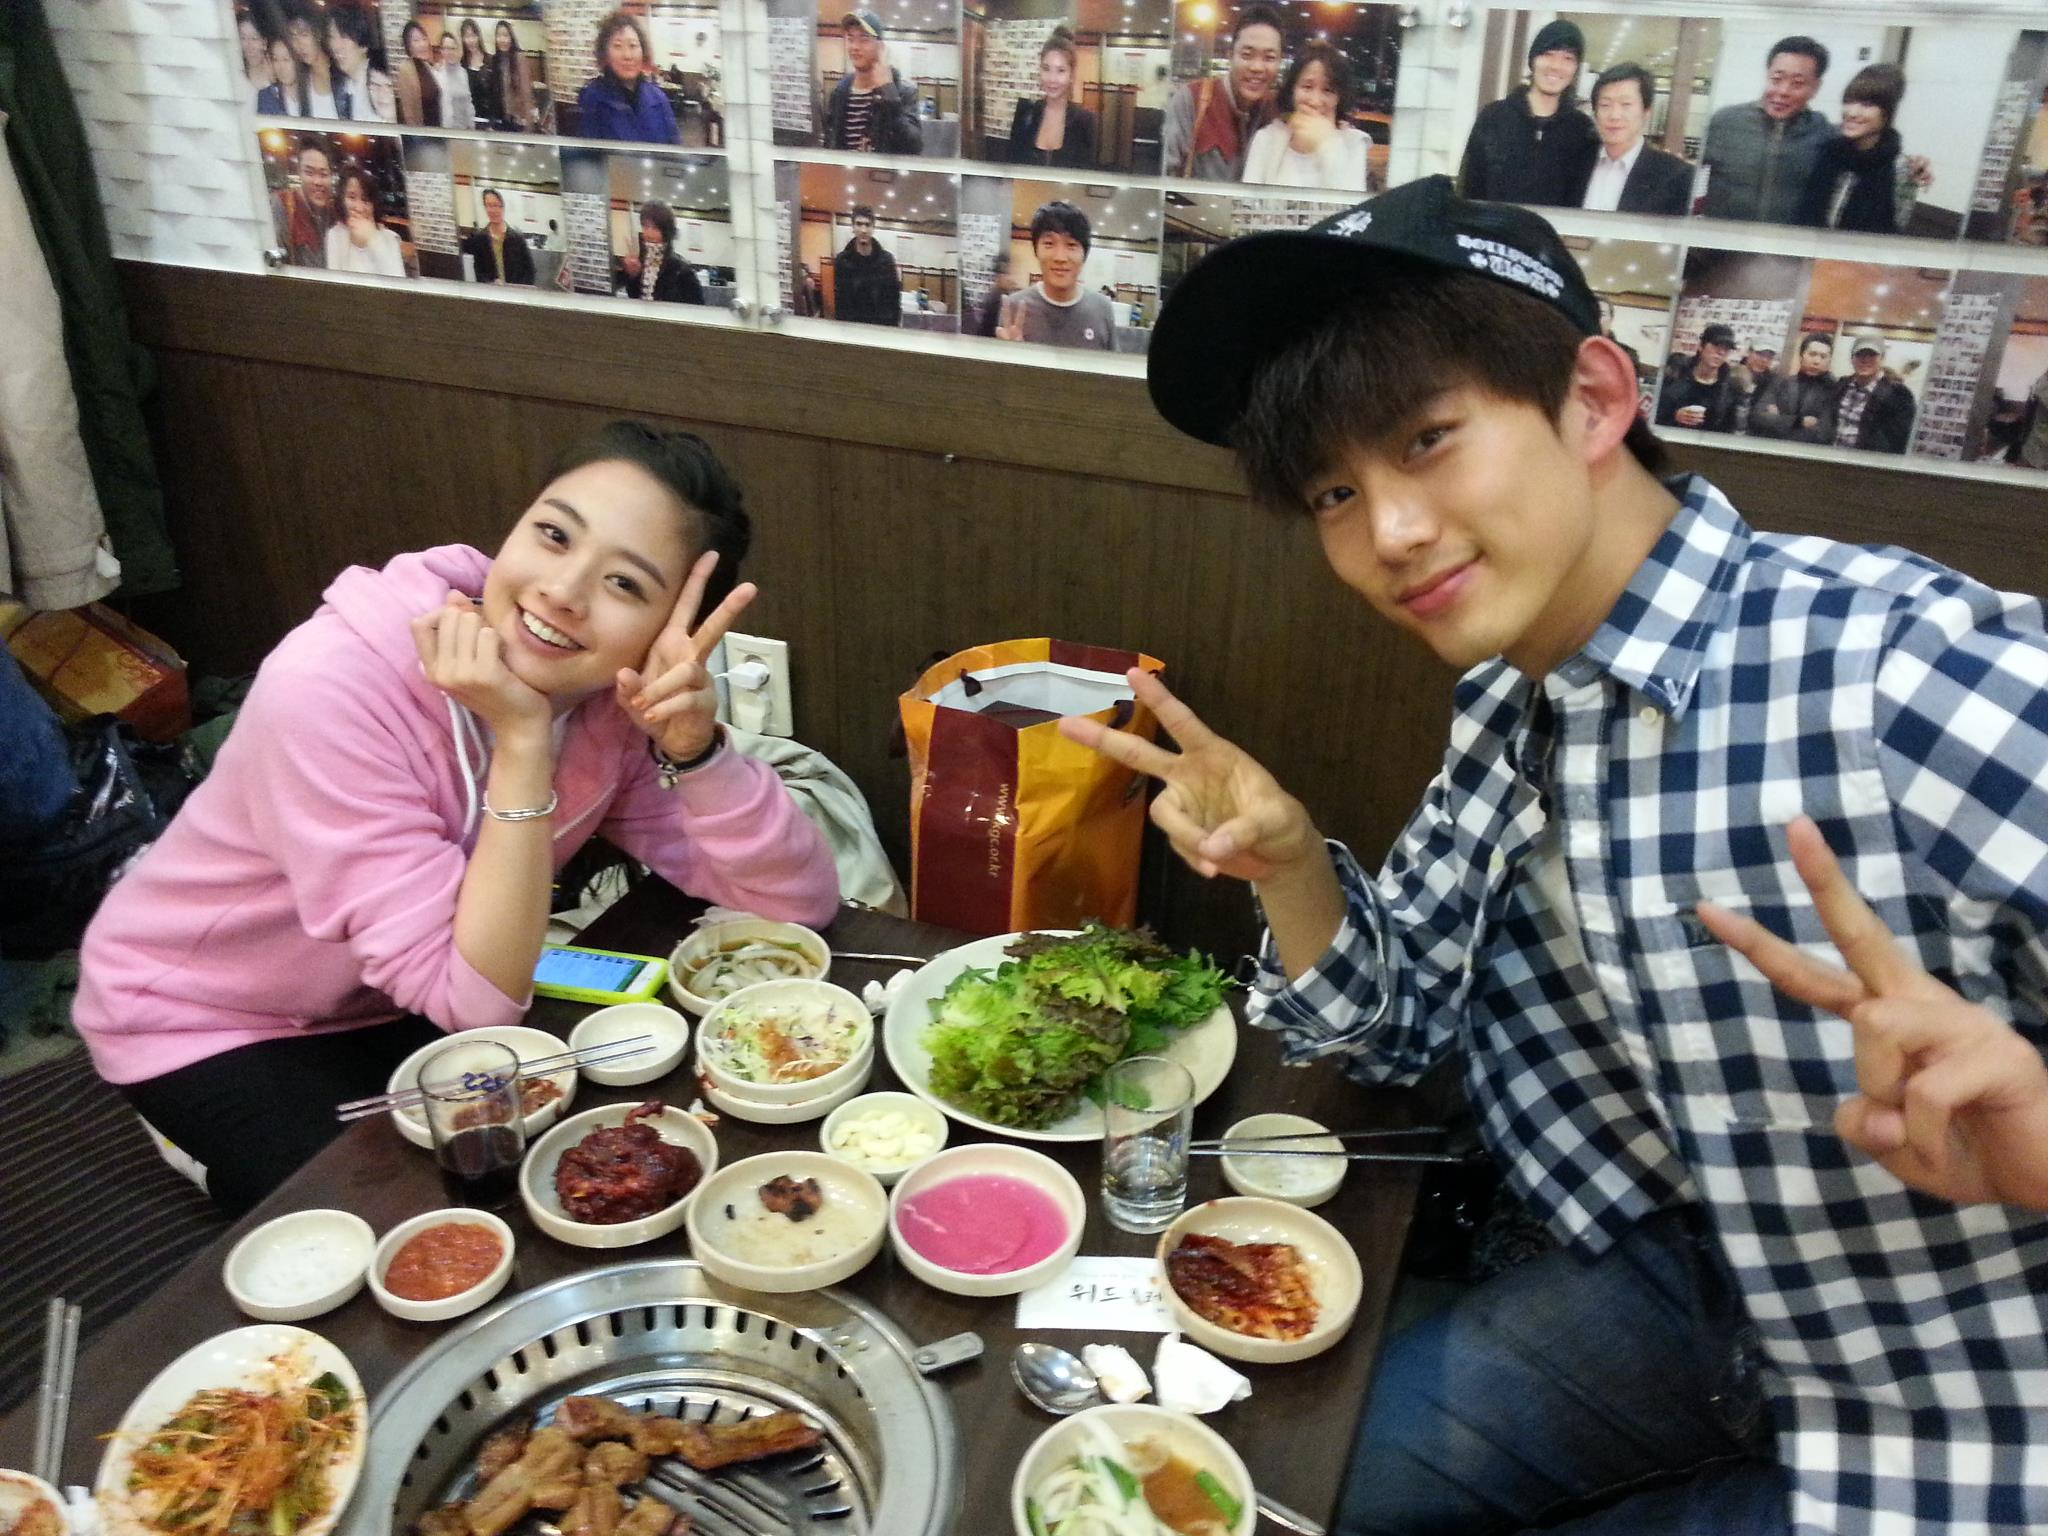 Global We Got Married Episode 1 Taecyeon Emma Korean Shows Running Man Wgm Eng Subs